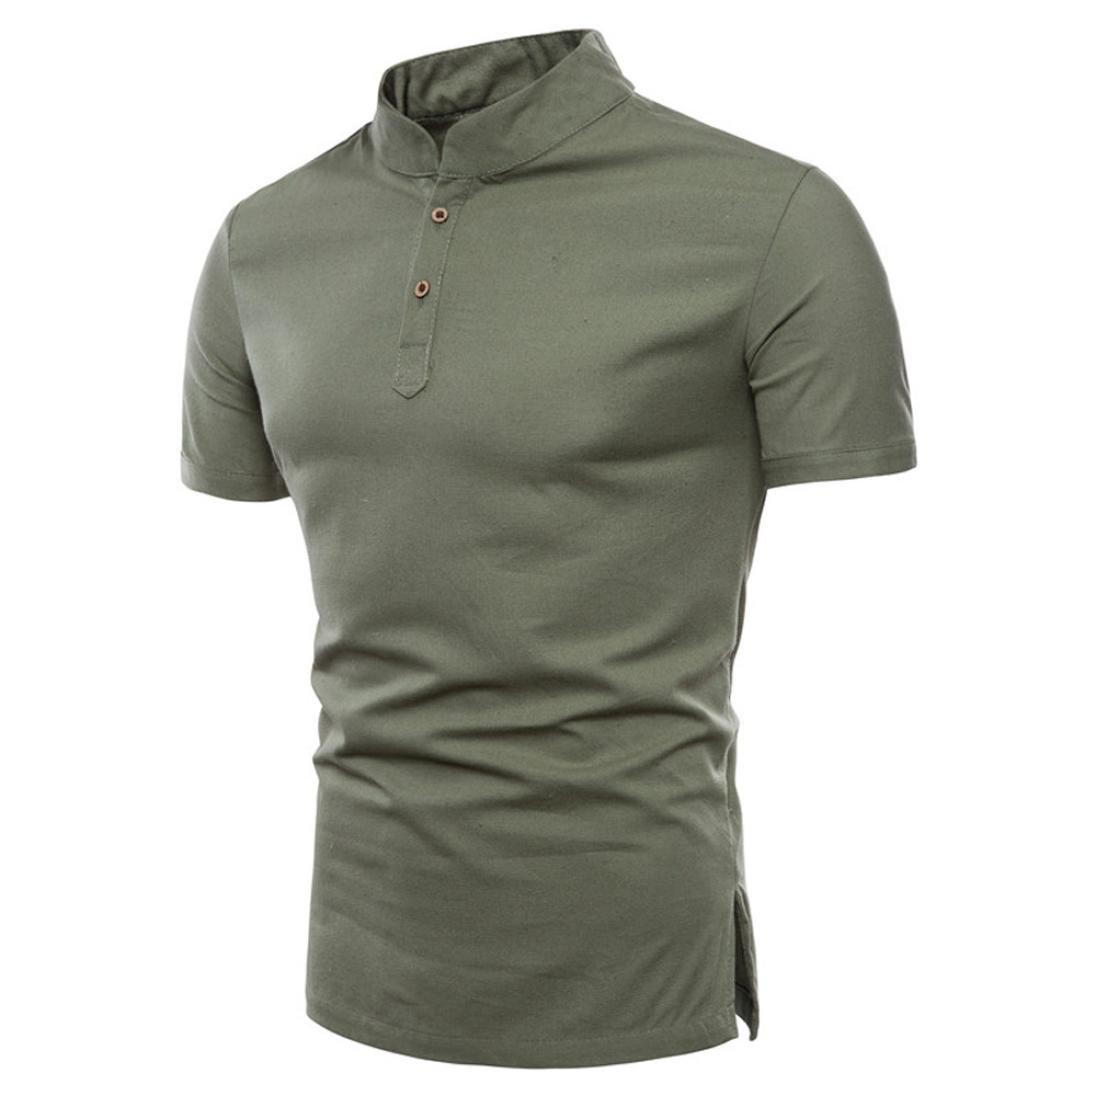 RETUROM -Camisetas Camiseta para Hombre, Manga Corta para Hombre con Cuello Redondo y Manga Corta (M, Gris Oscuro): Amazon.es: Ropa y accesorios